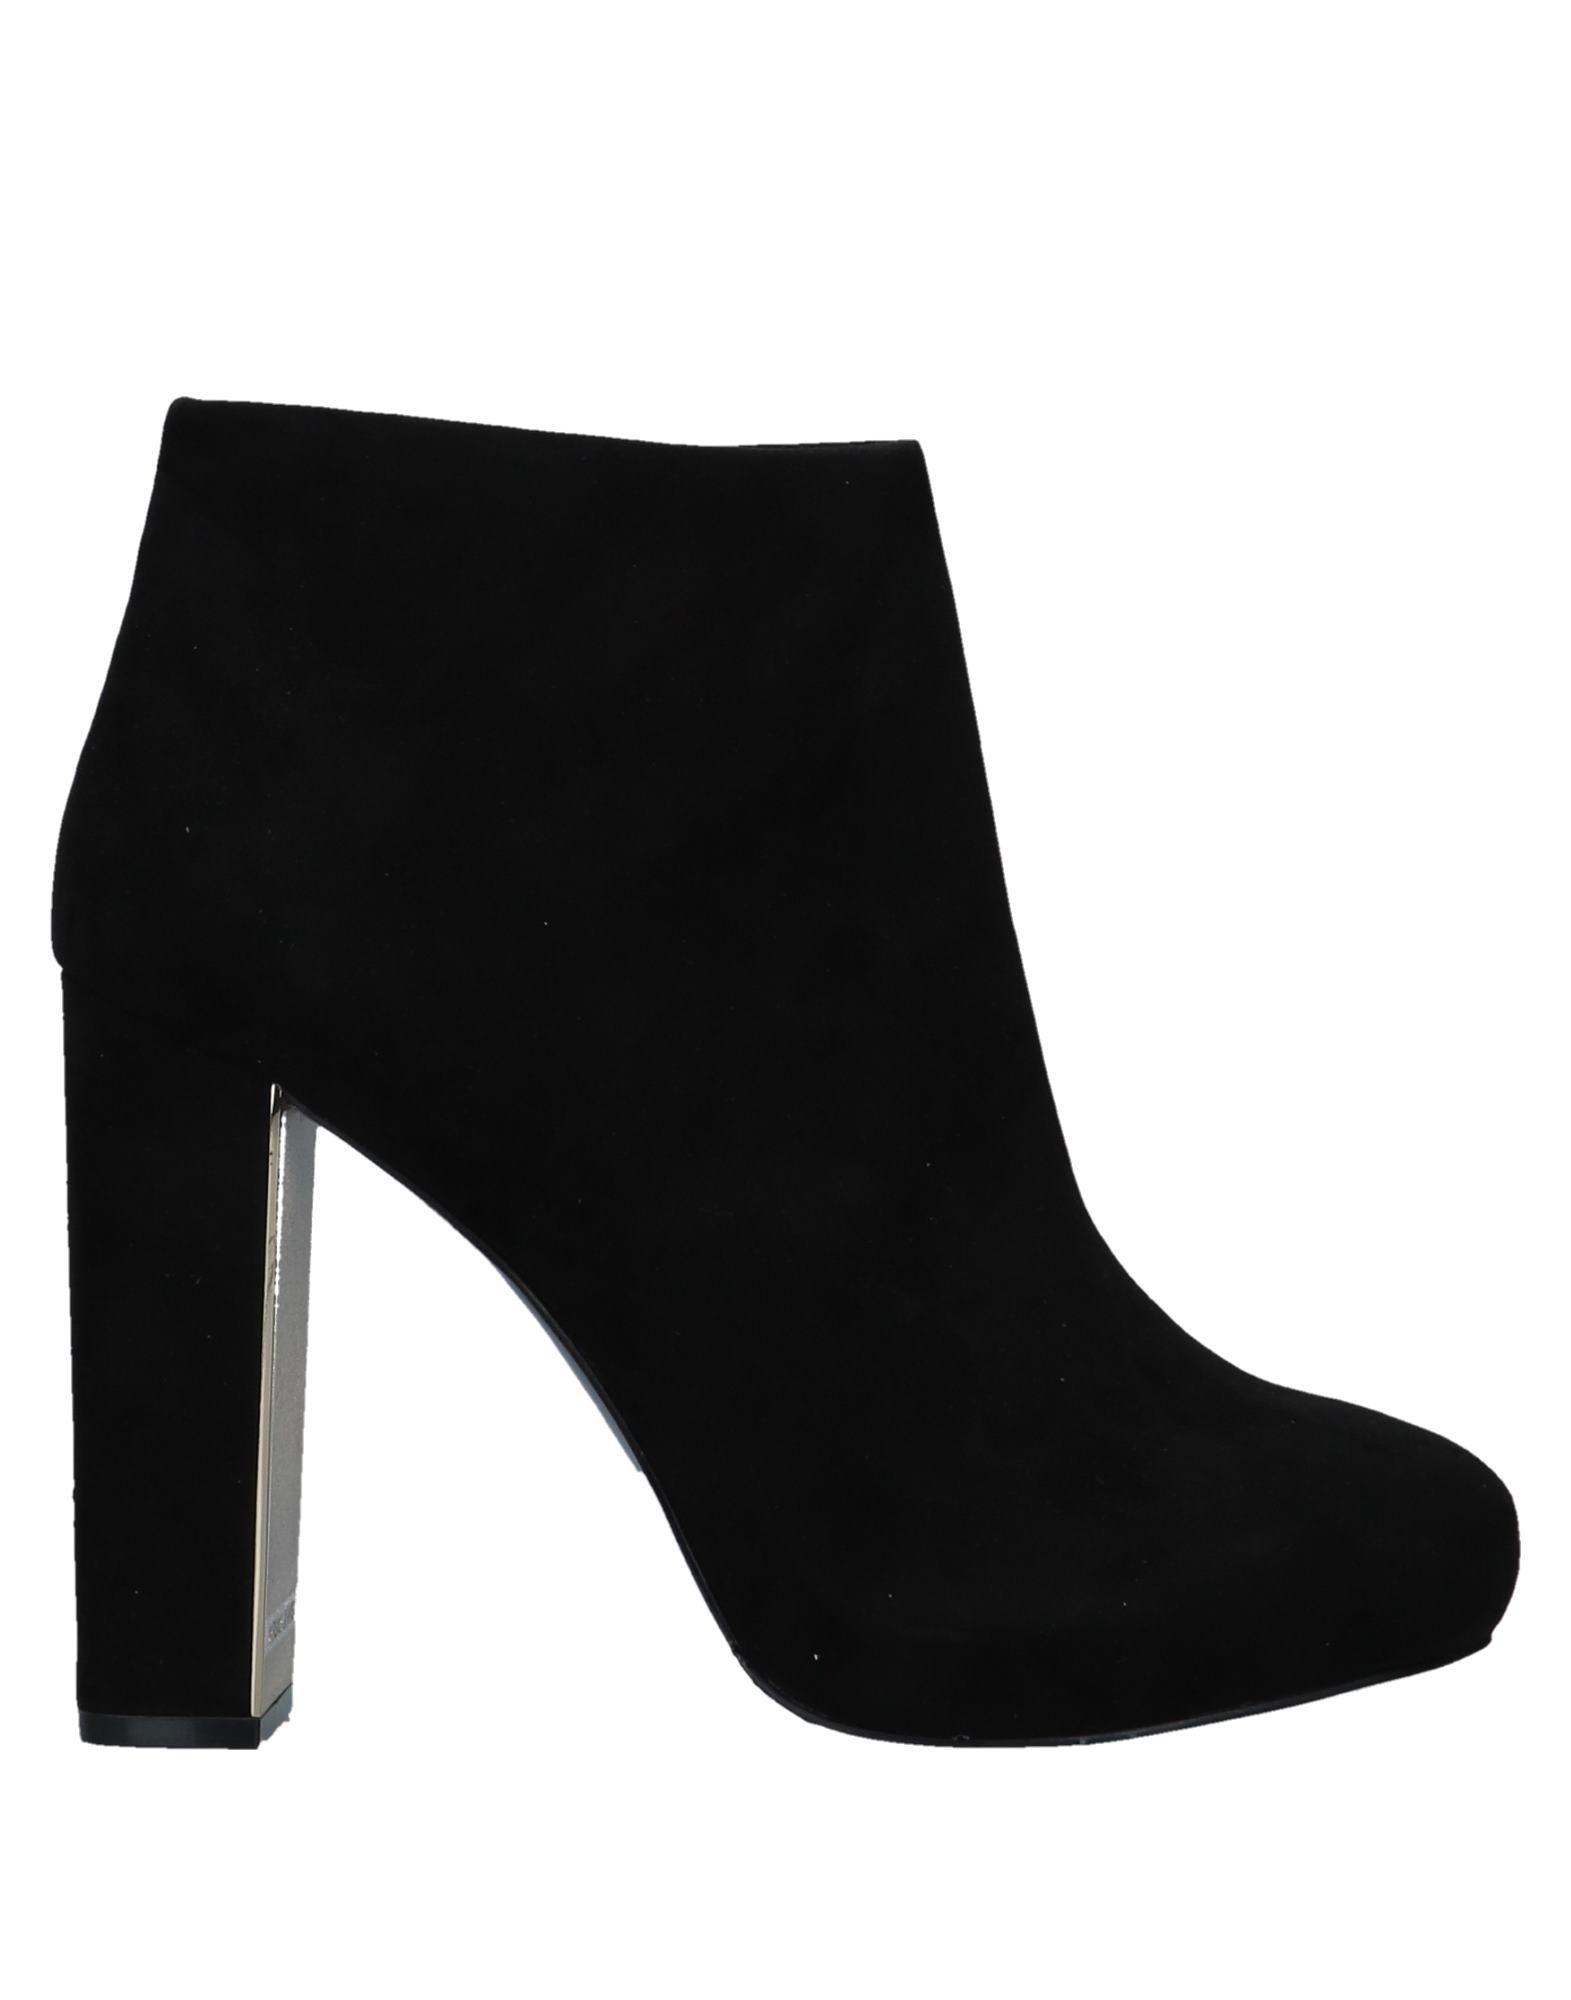 Versace Jeans Stiefelette Damen  11521311LO 11521311LO  Neue Schuhe 62feea